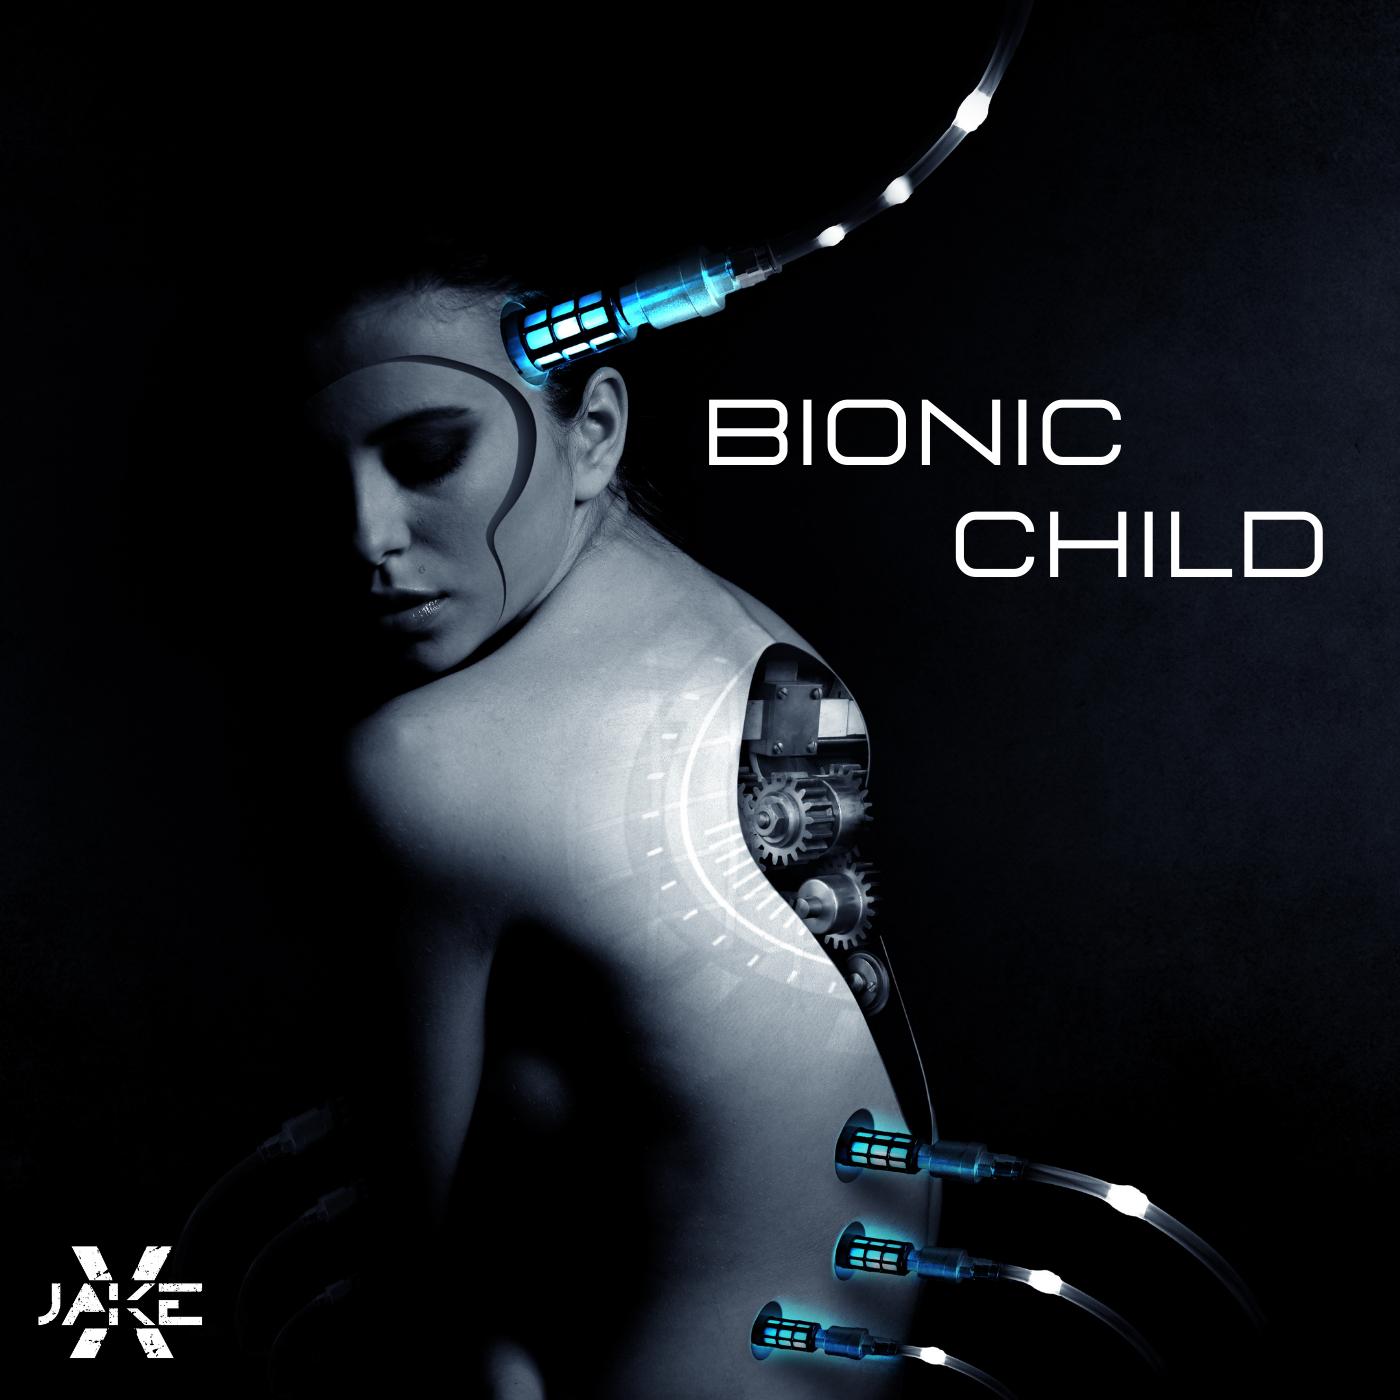 Jake X - Bionic Child(Guitaa Music Review)